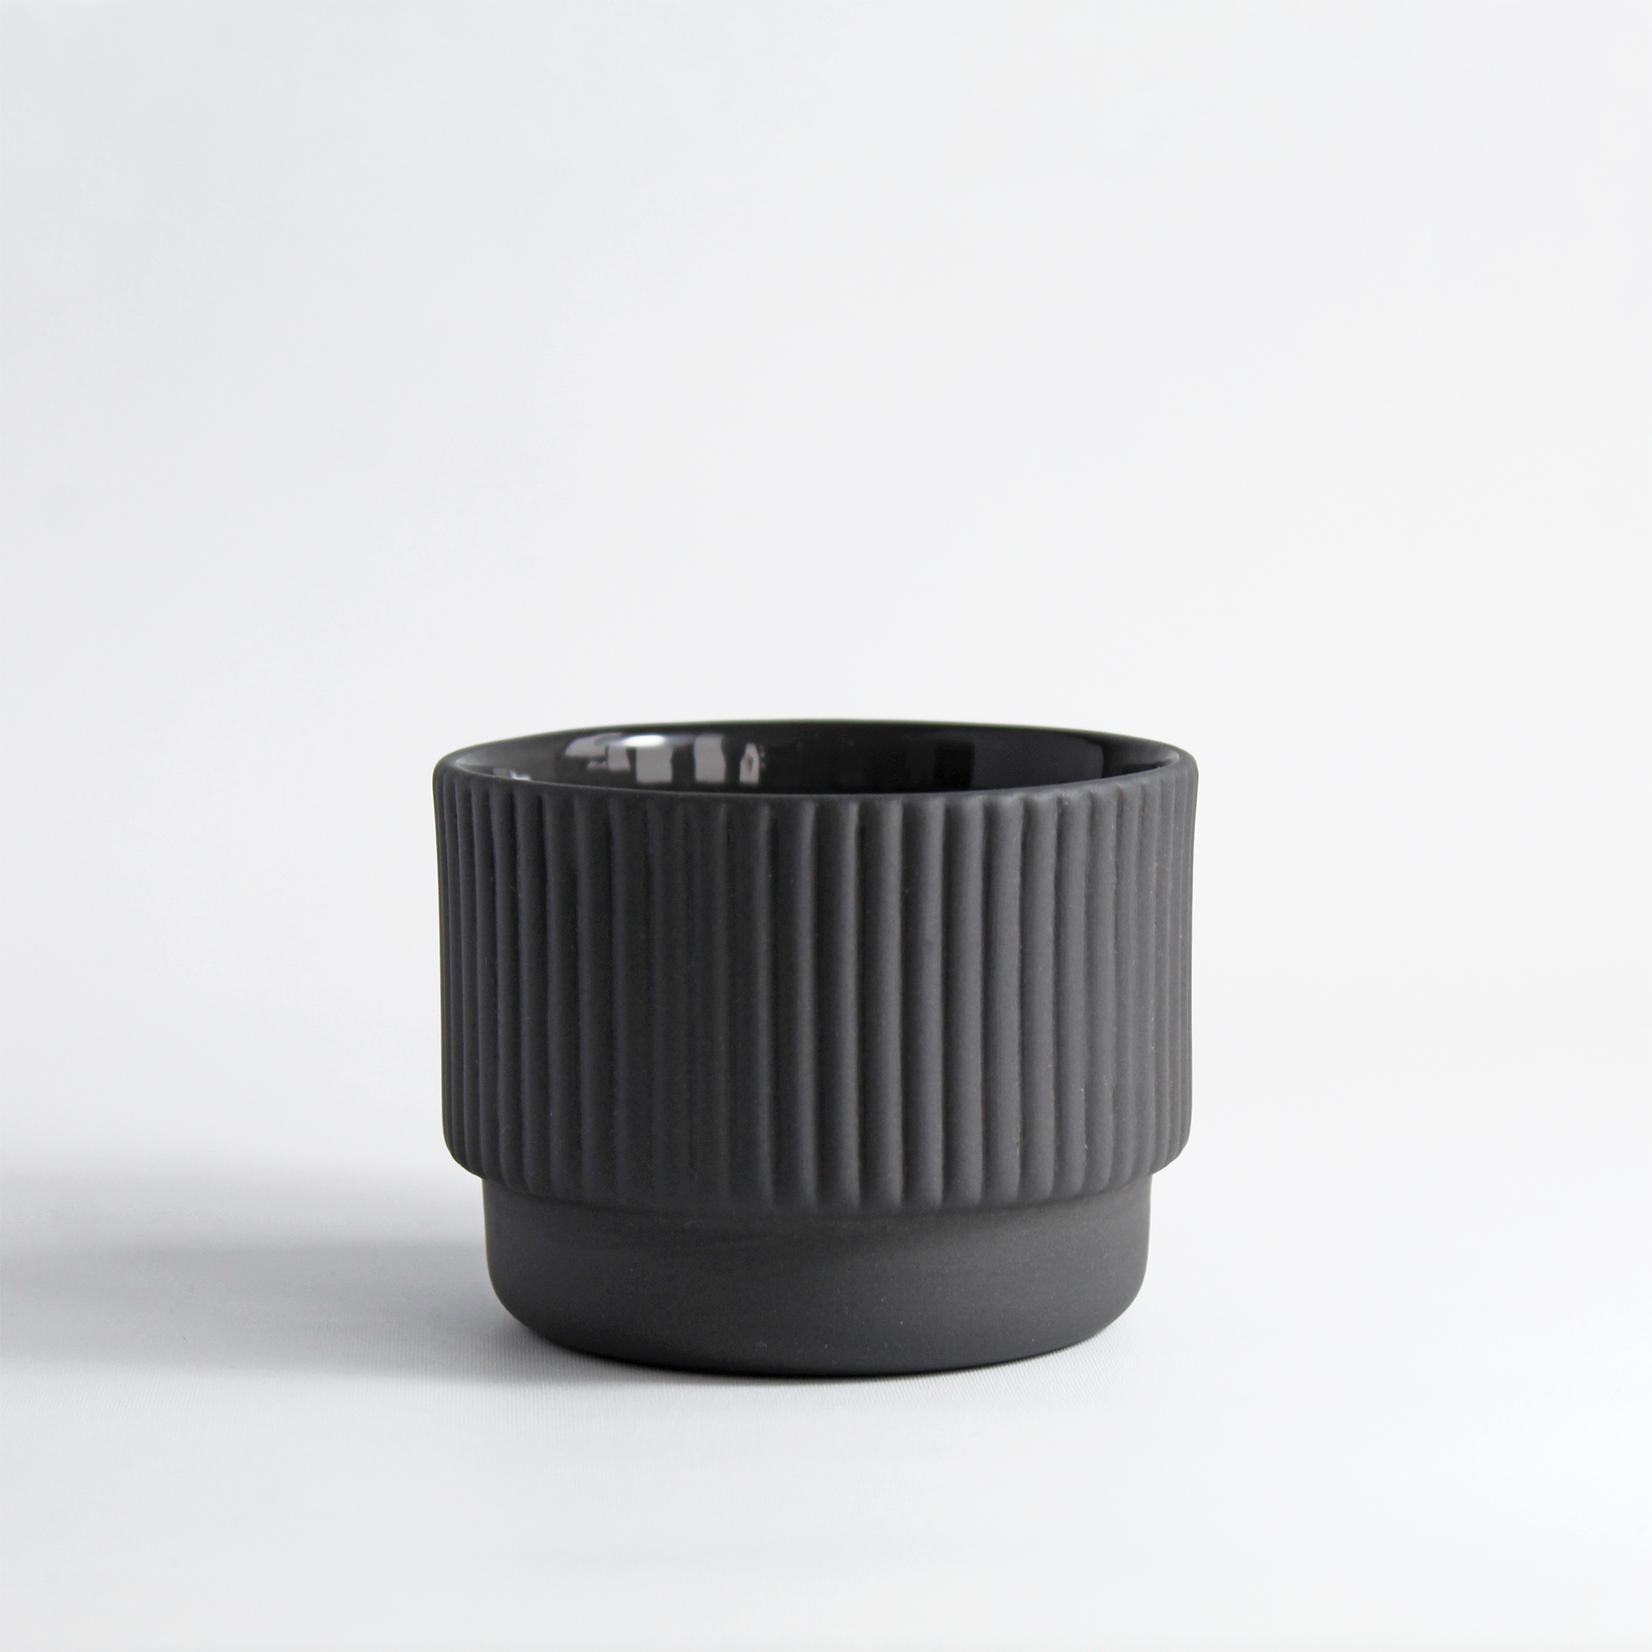 Archive Studio Archive Studio Handmade Cappuccino Cup Ribbed Dark Grey